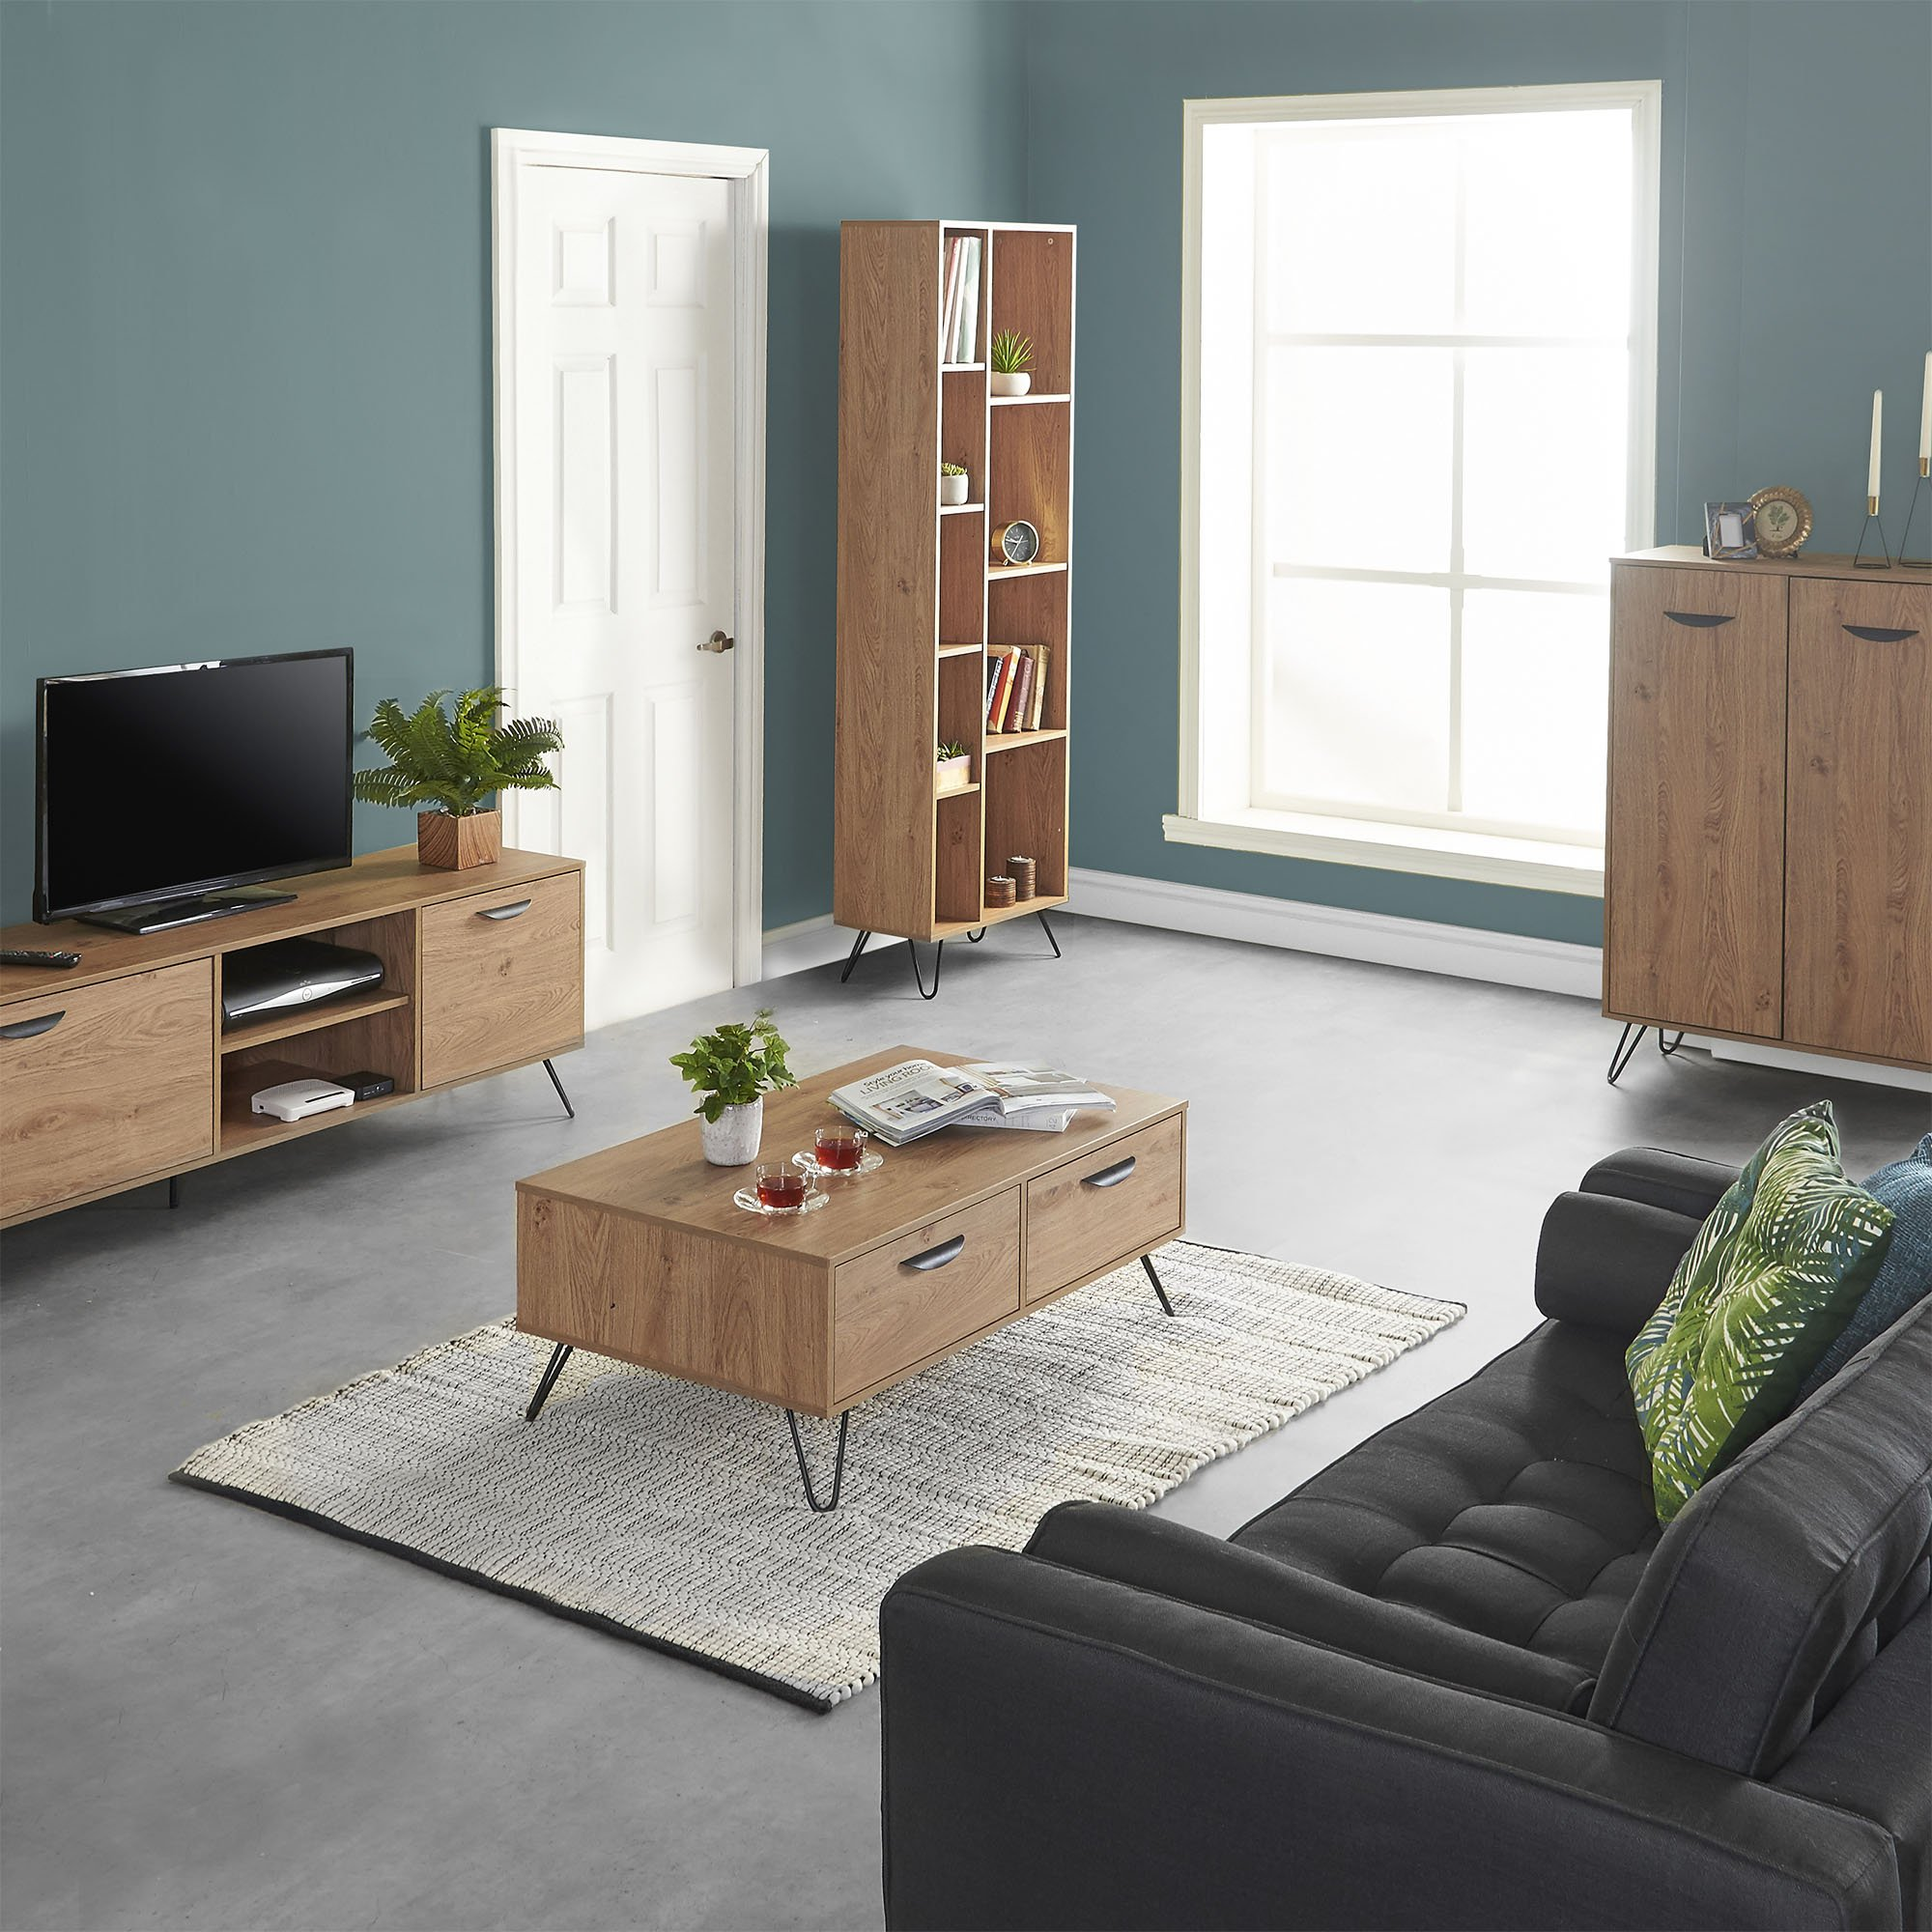 vonhaus capri coffee table with 2 soft close drawers oak effect